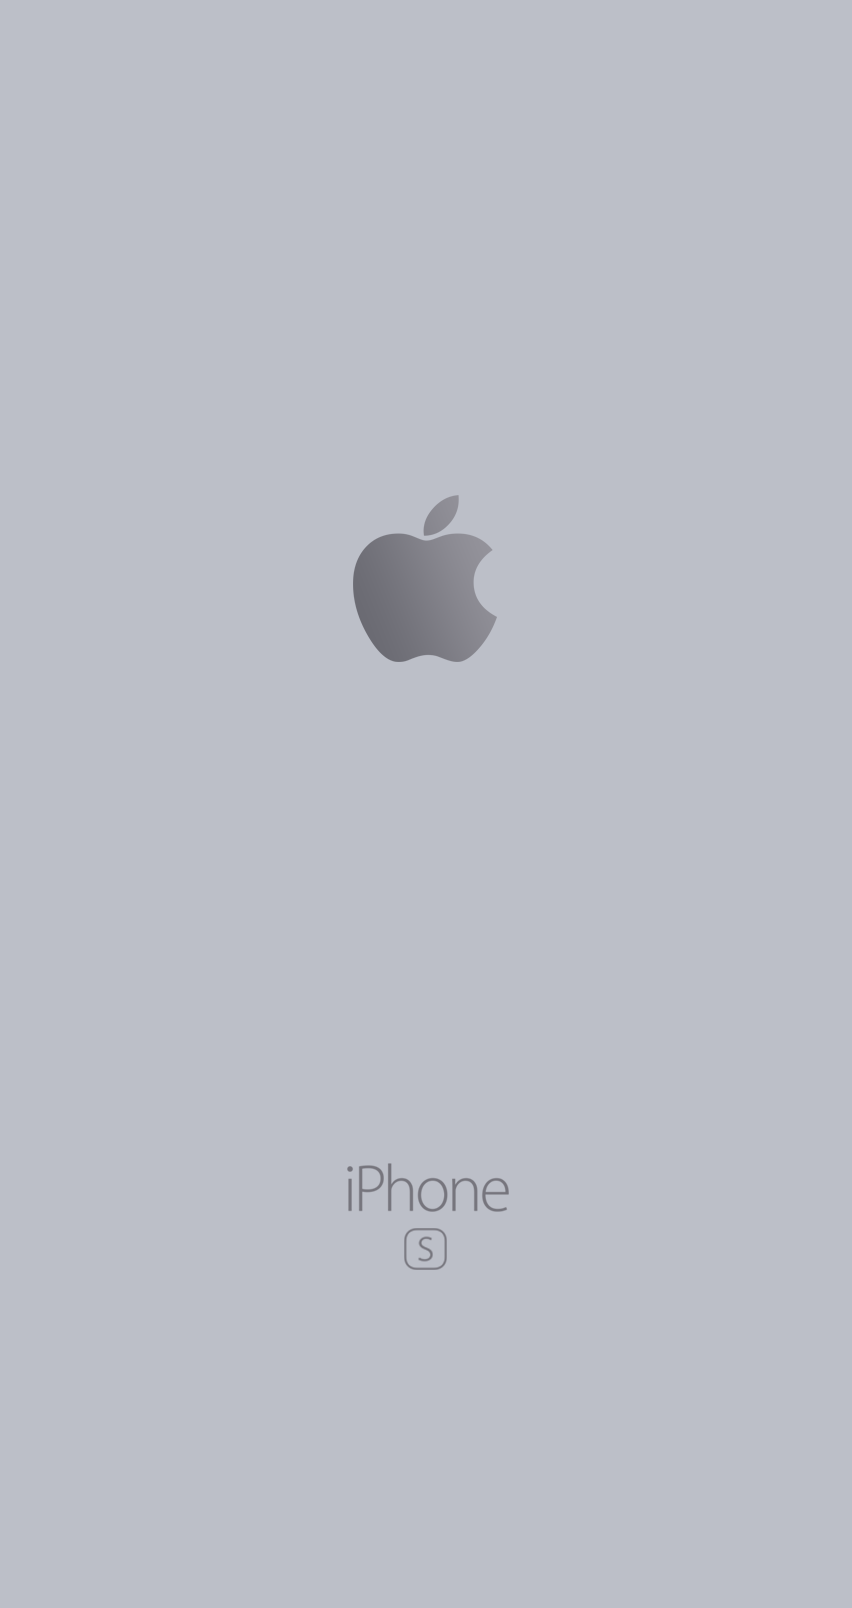 Iphone 6s Wallpaper Grey Logo Apple Fond D Ecran Gris Gambar Wallpaper Ponsel Stiker